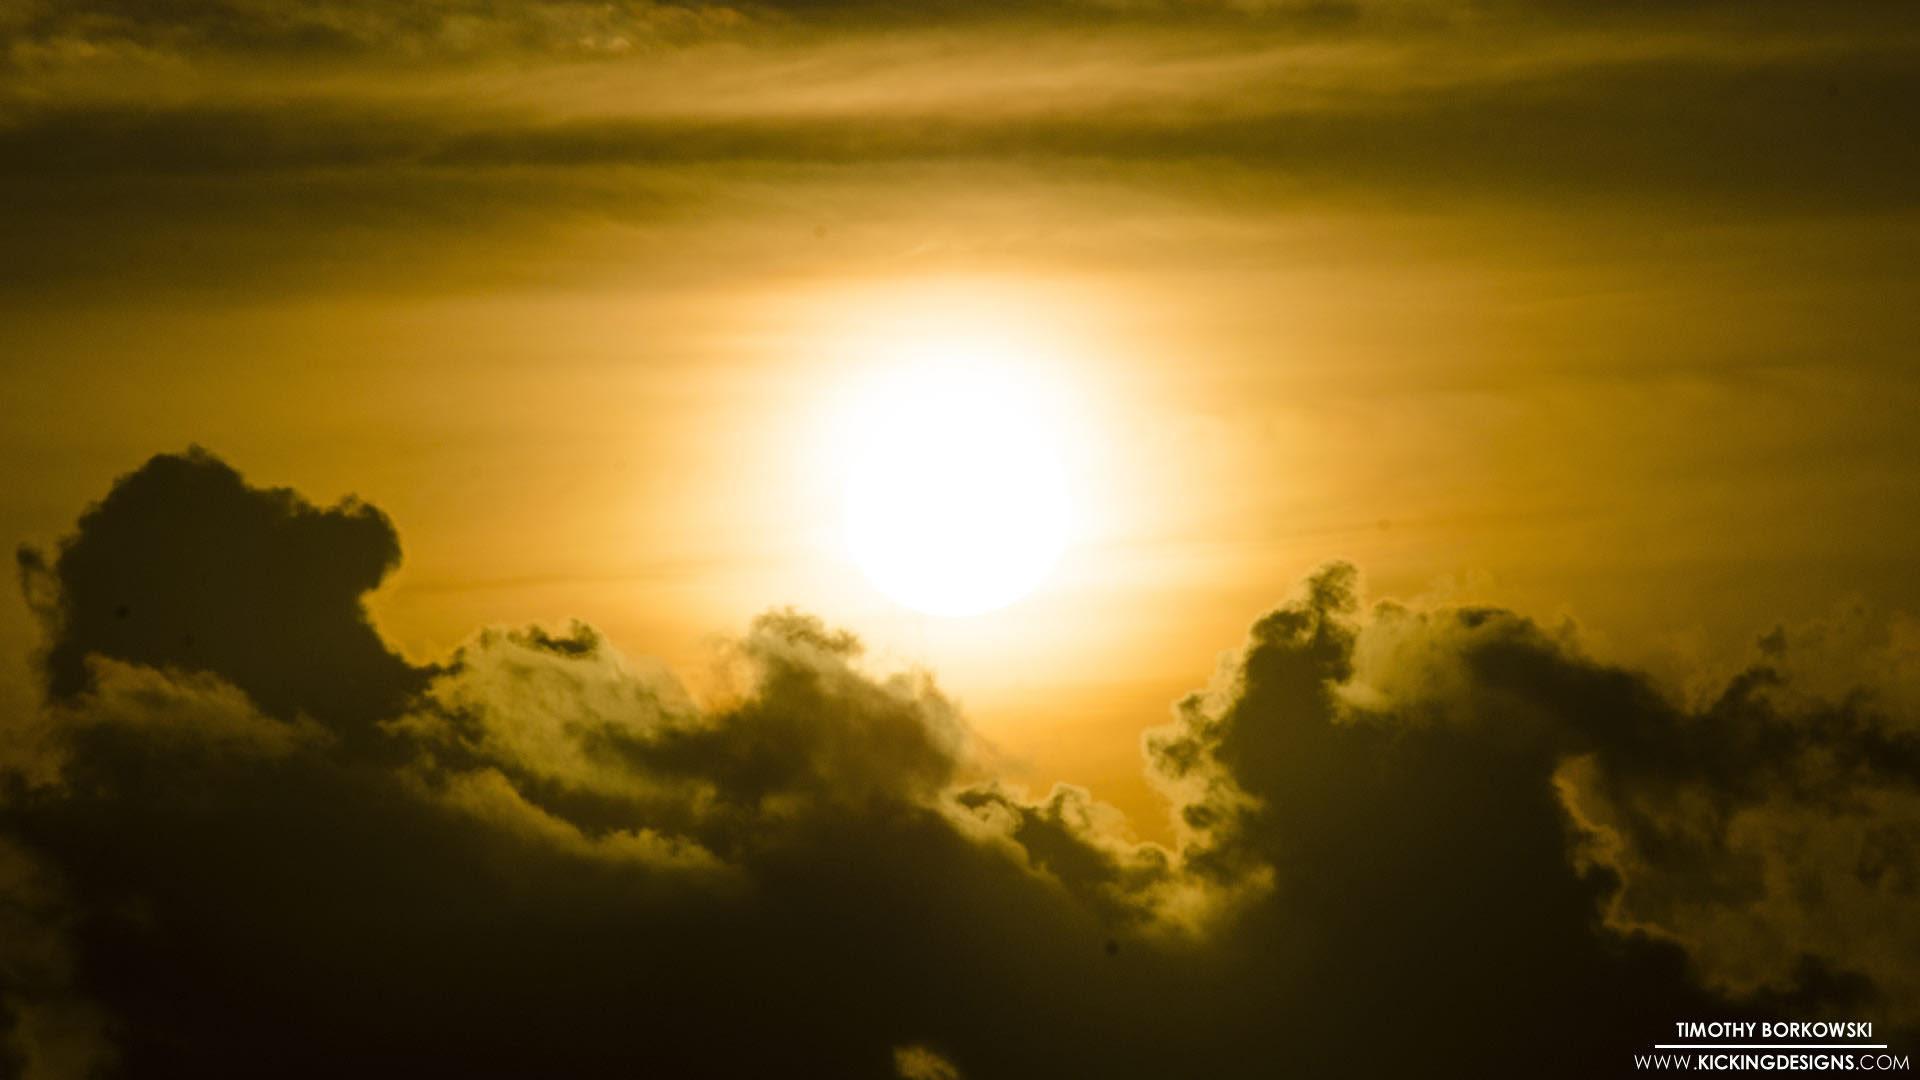 bermuda-sunrise-4-24-2017_full-hd